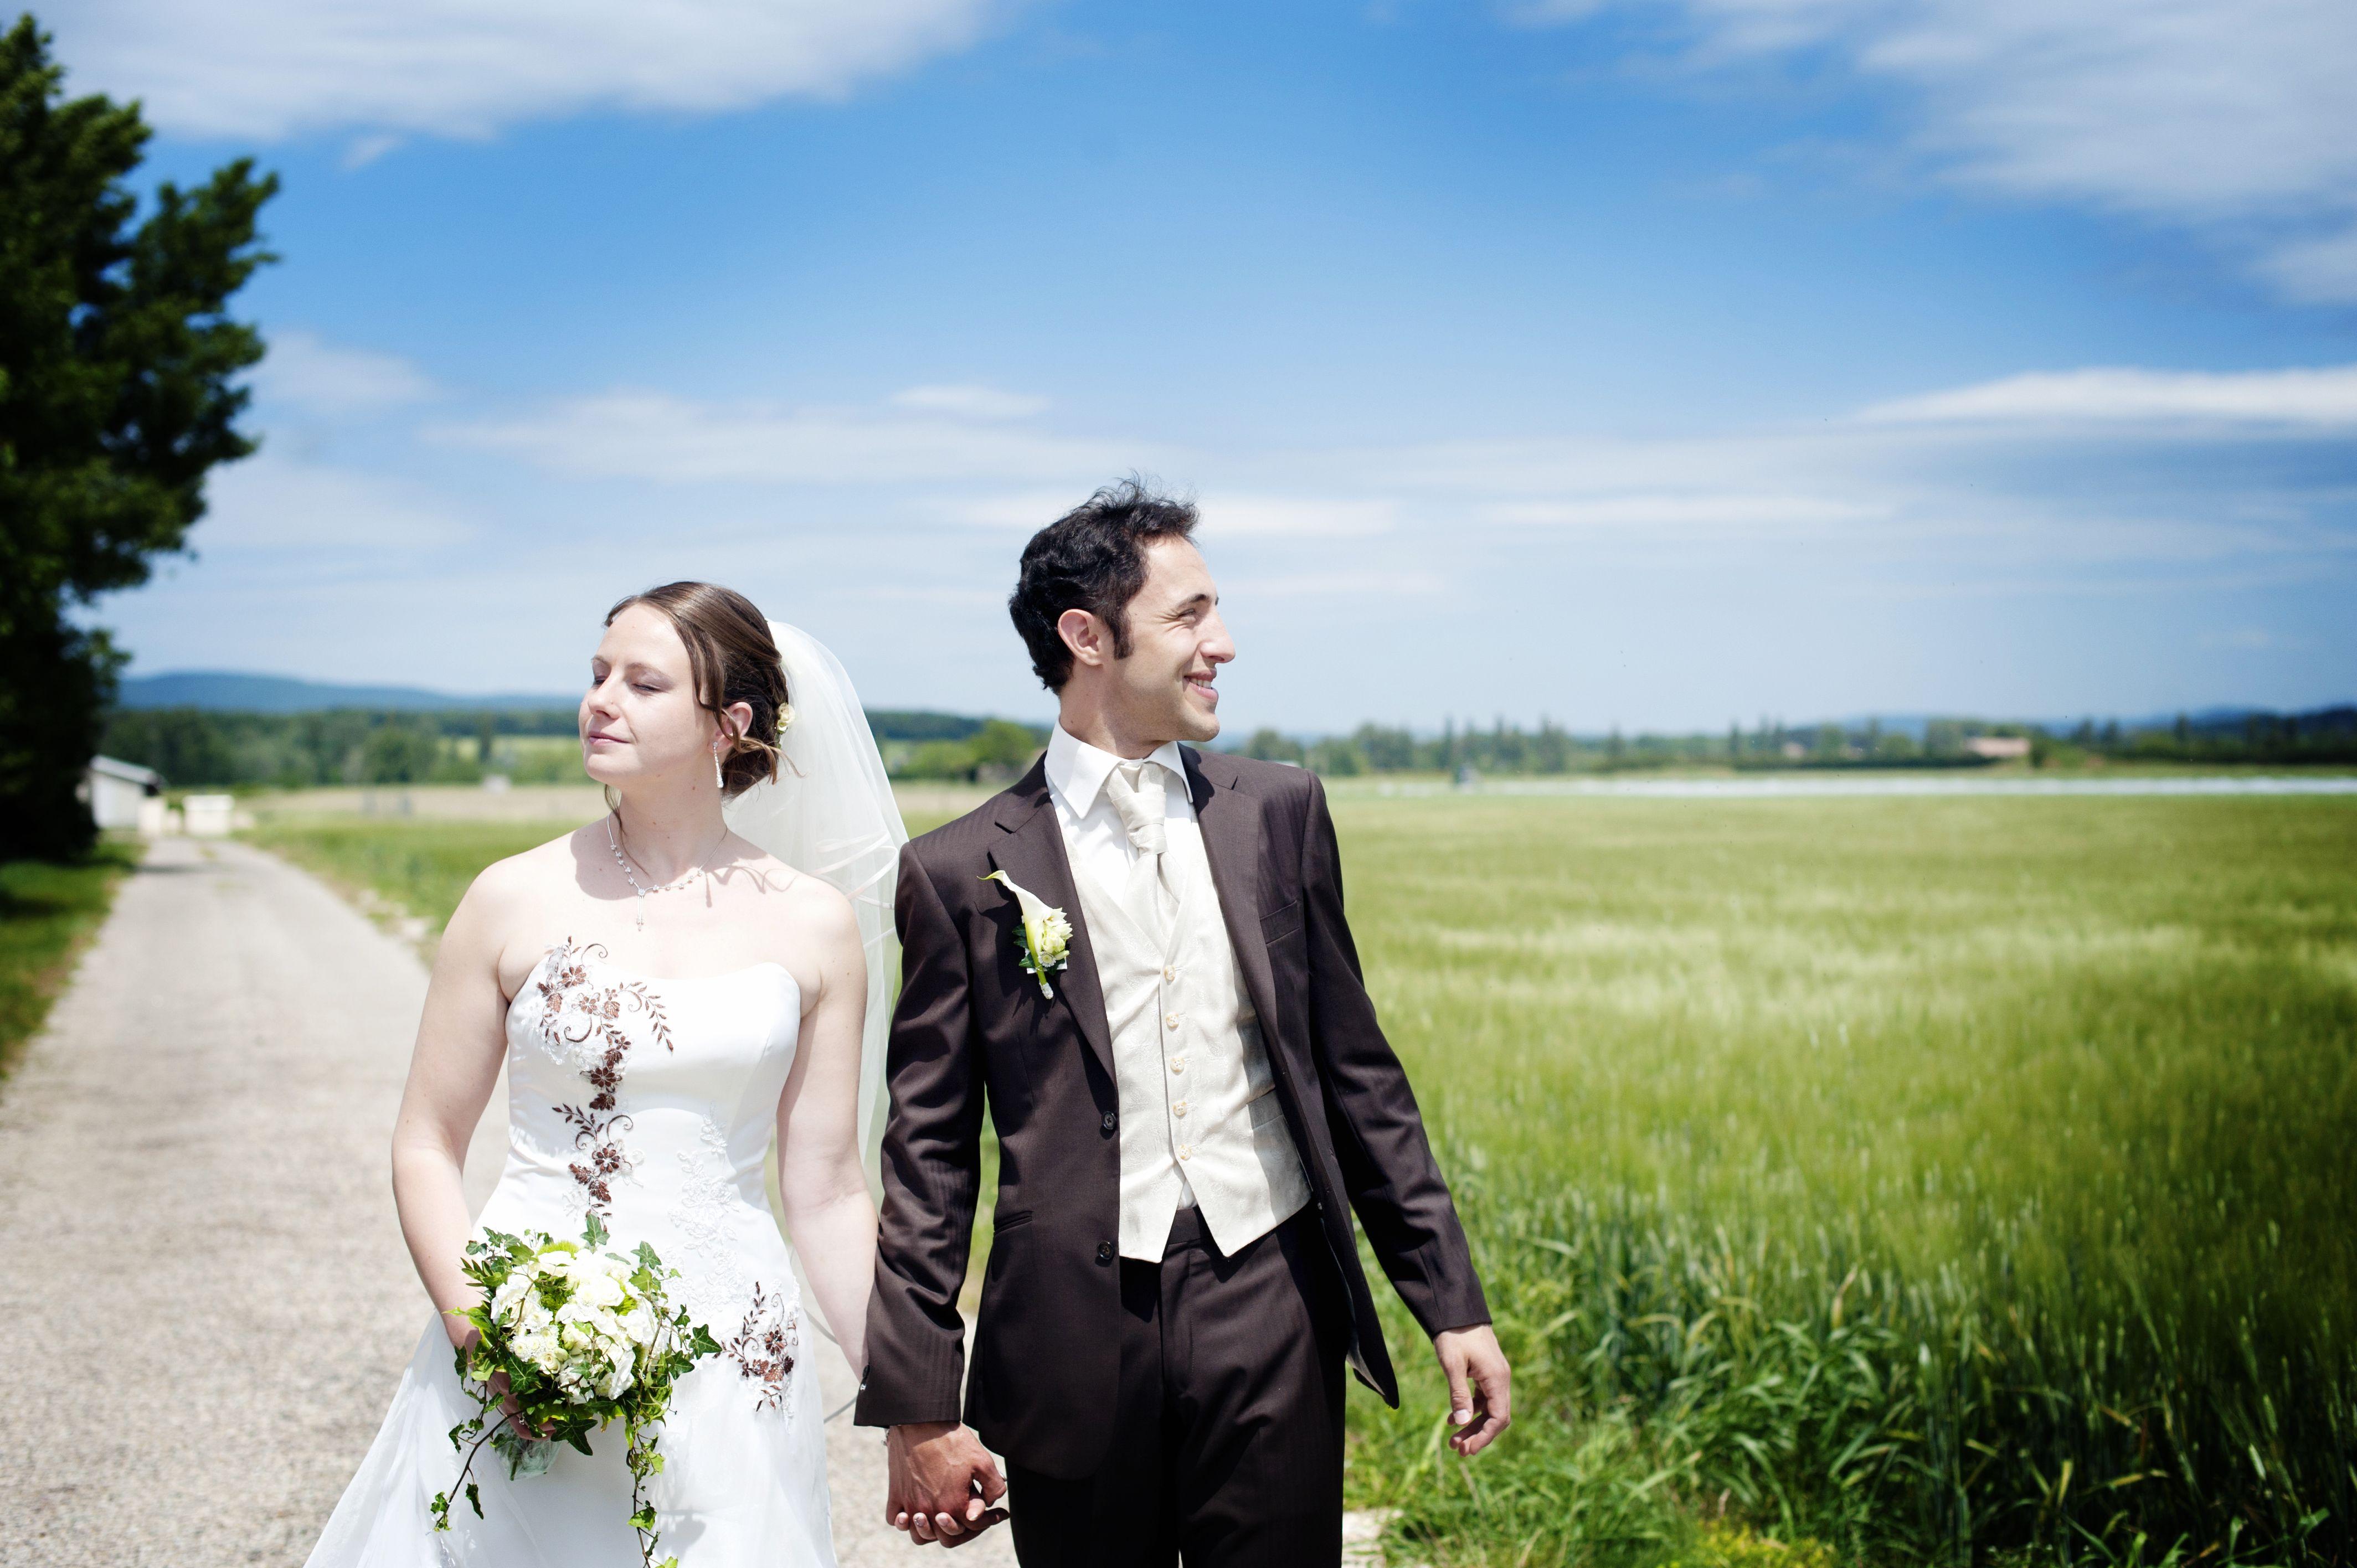 Great shot outdoor, Wedding, Couple walking